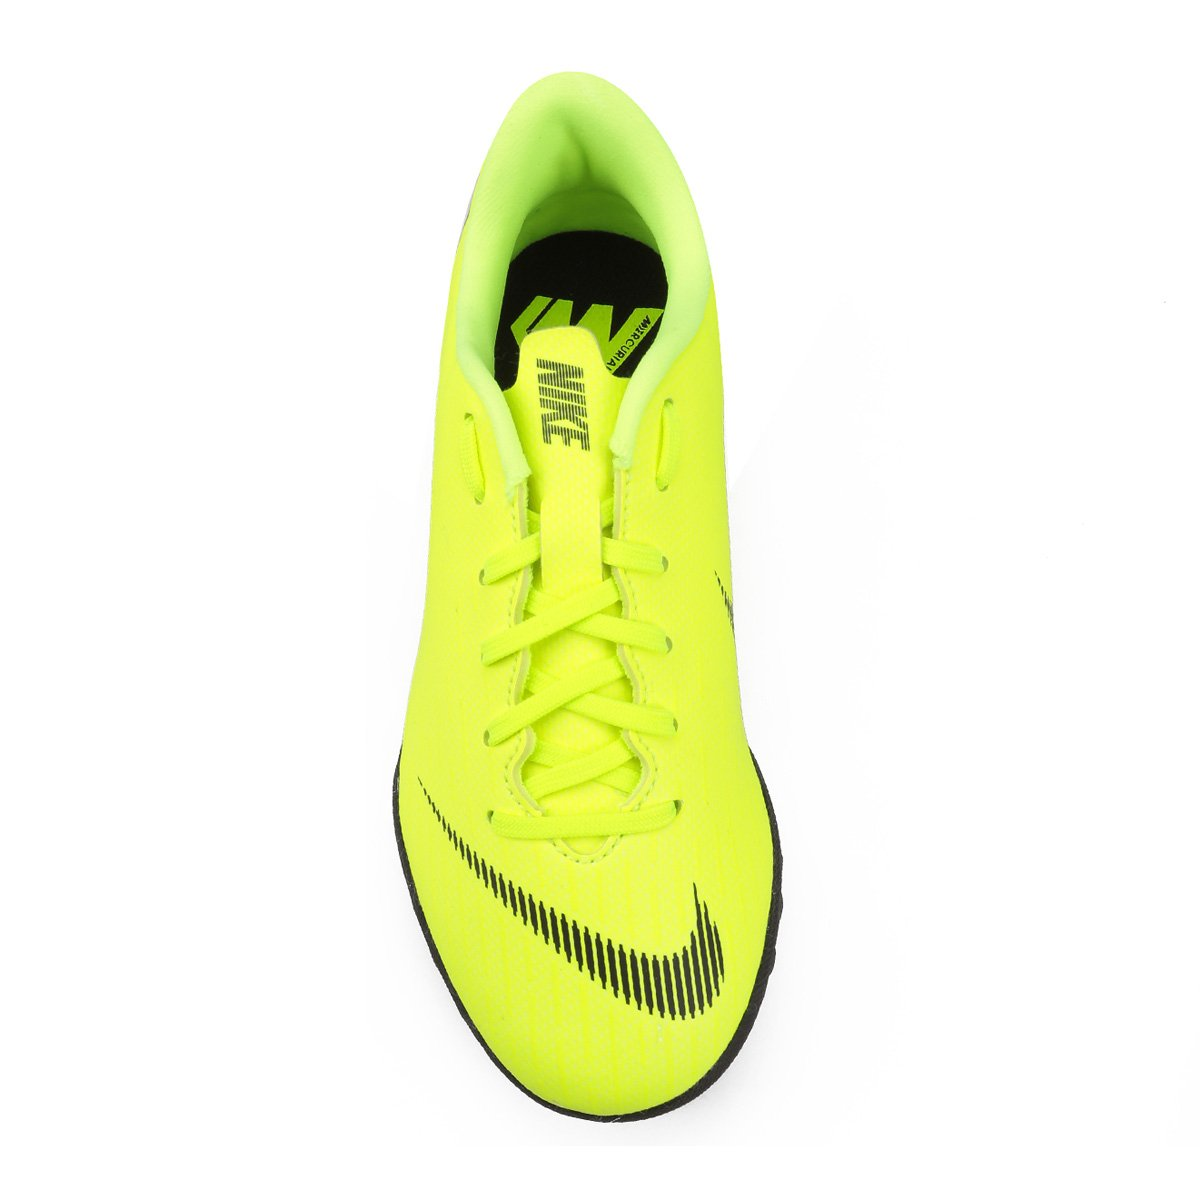 66a1254768 ... Chuteira Society Infantil Nike Mercurial Vapor 12 Academy GS TF ...